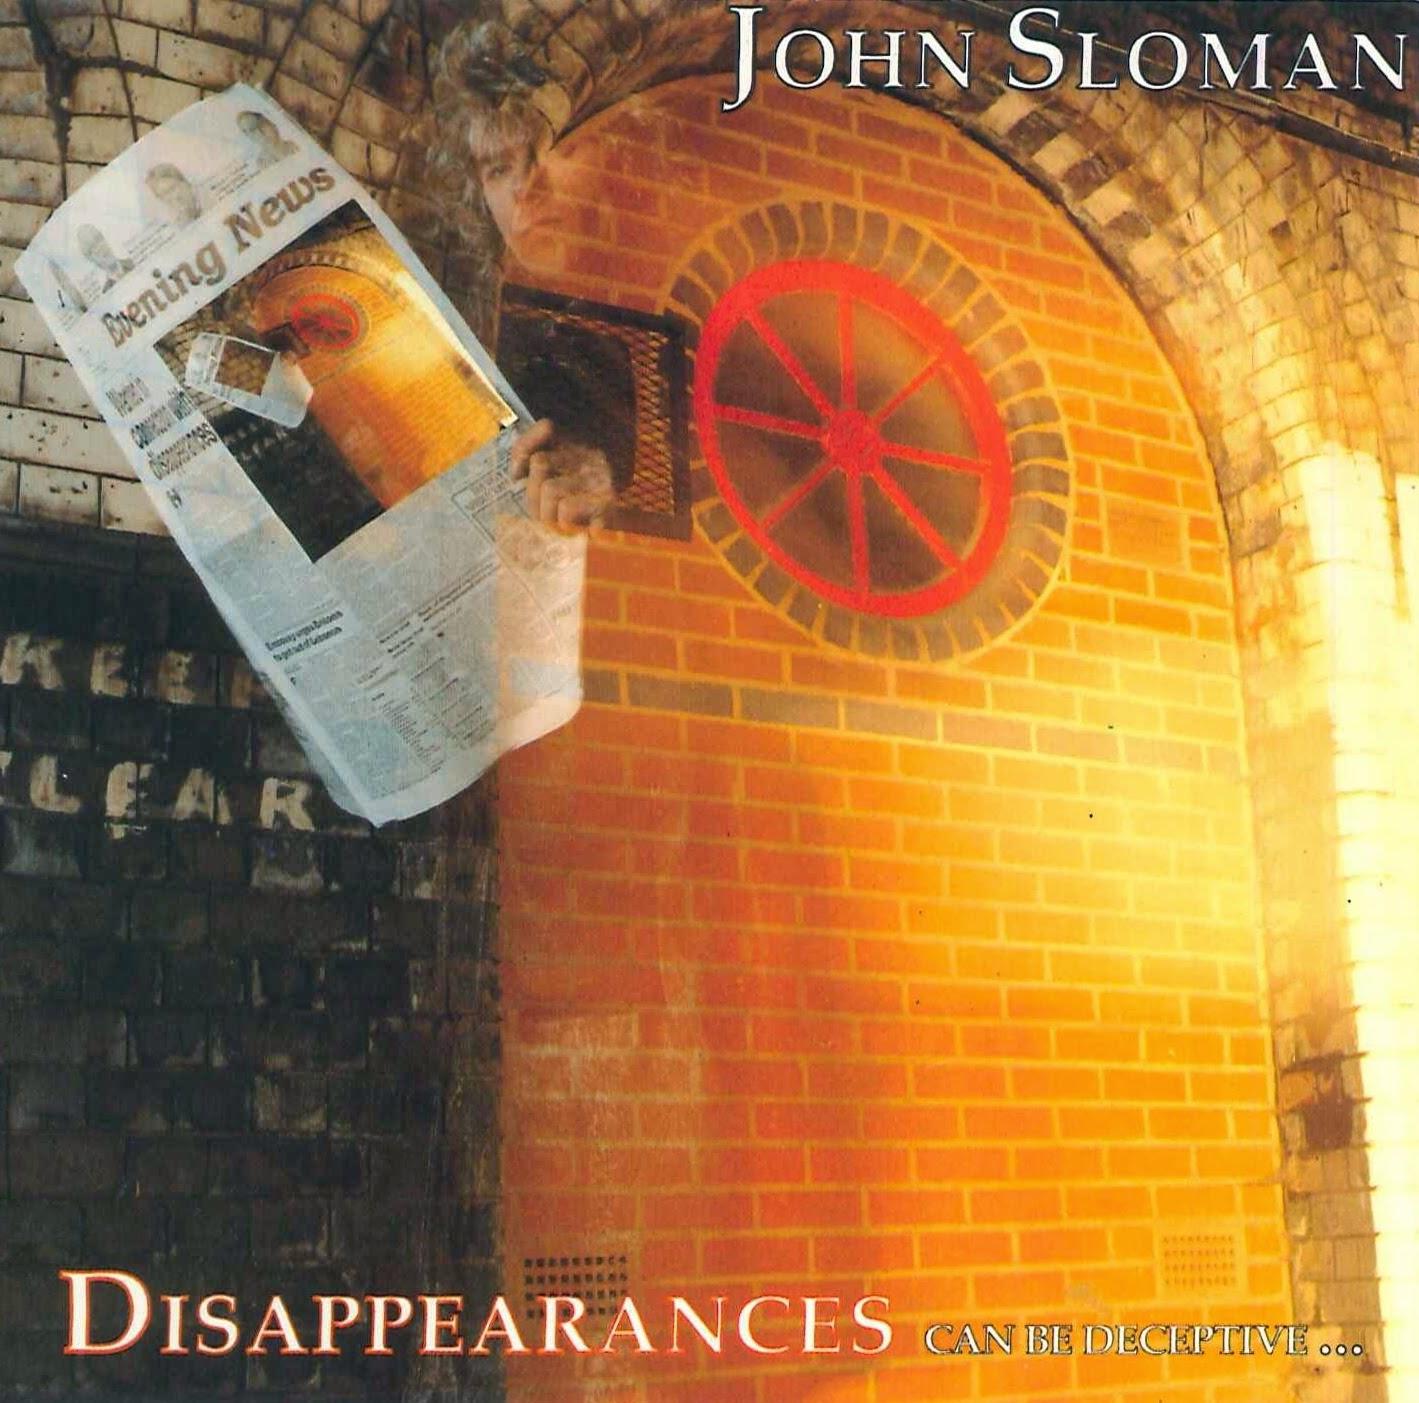 John Sloman Disappearances can be deceptive 1989